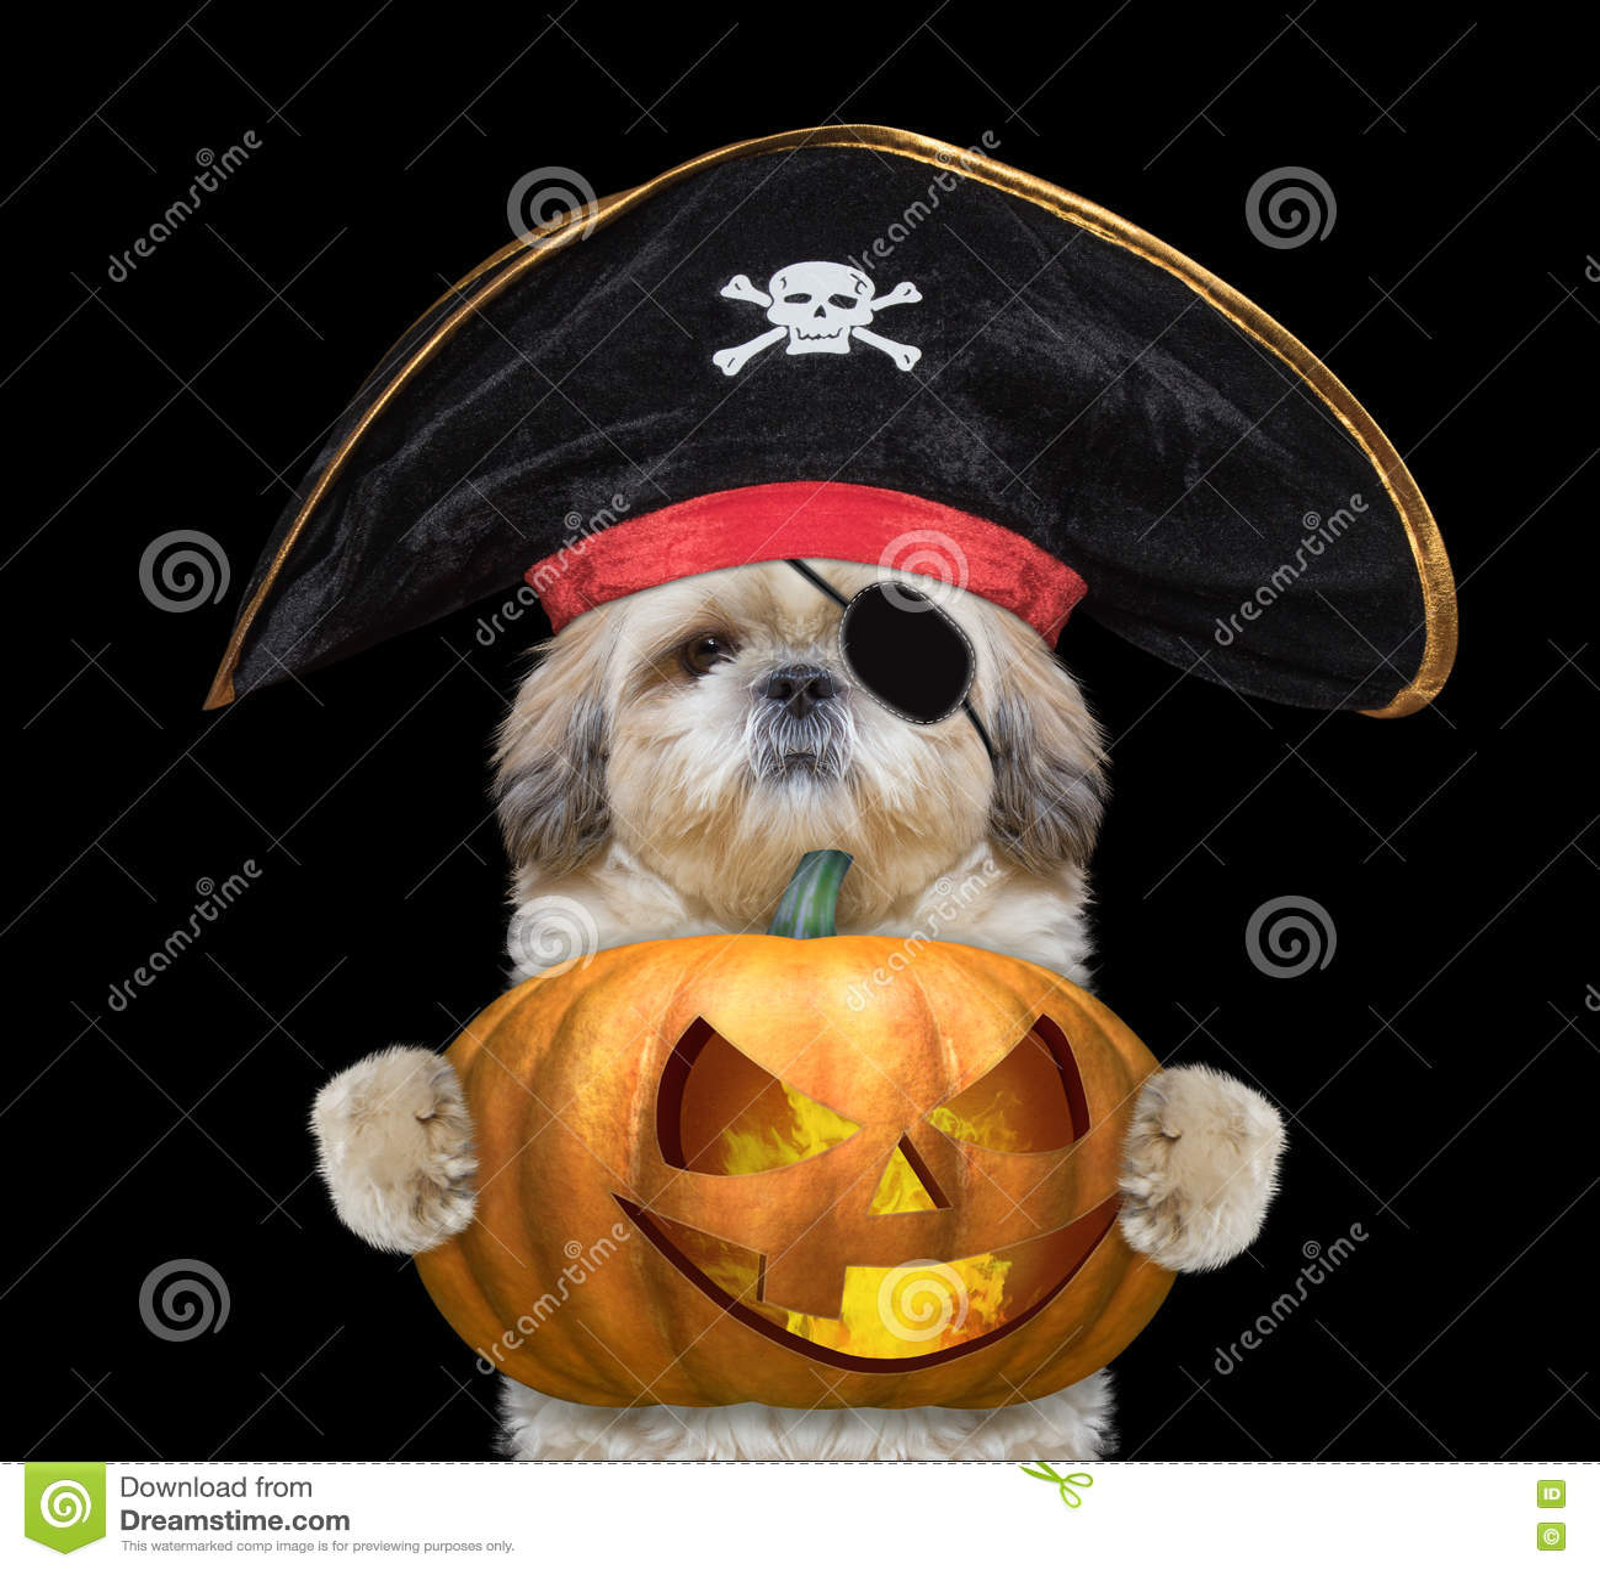 Cute dog in a pirate costume with halloweens pumpkin